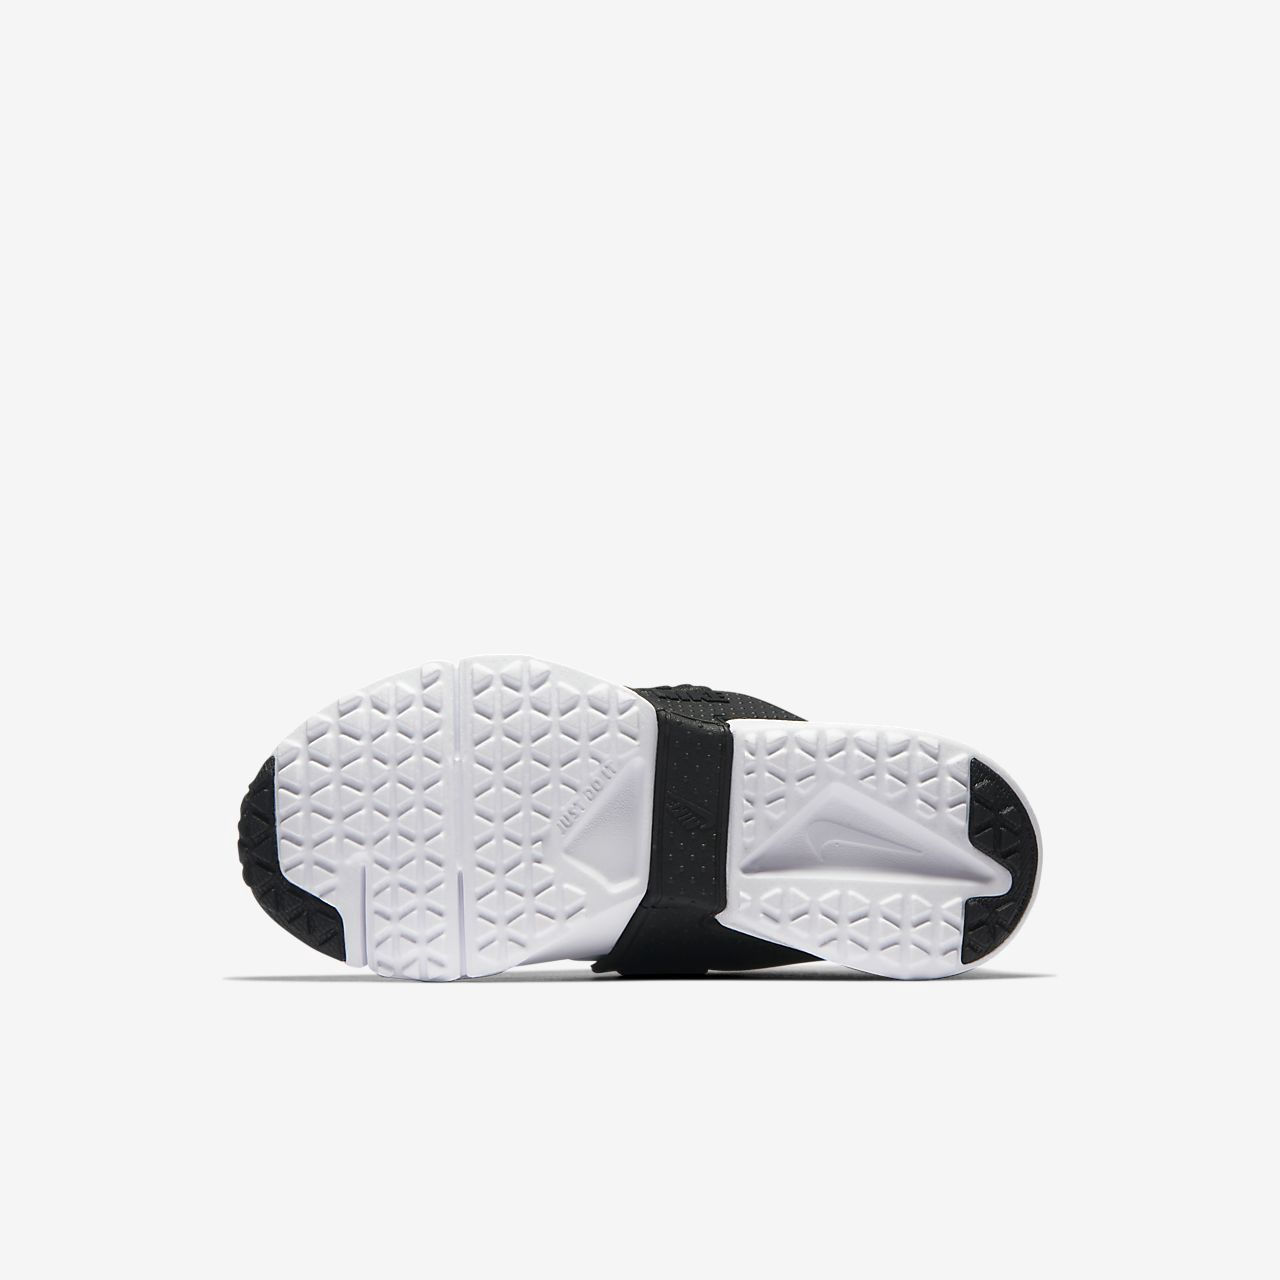 8e4a688d2f48 Nike Huarache Extreme Print Little Kids  Shoe - 11C Crimson ...